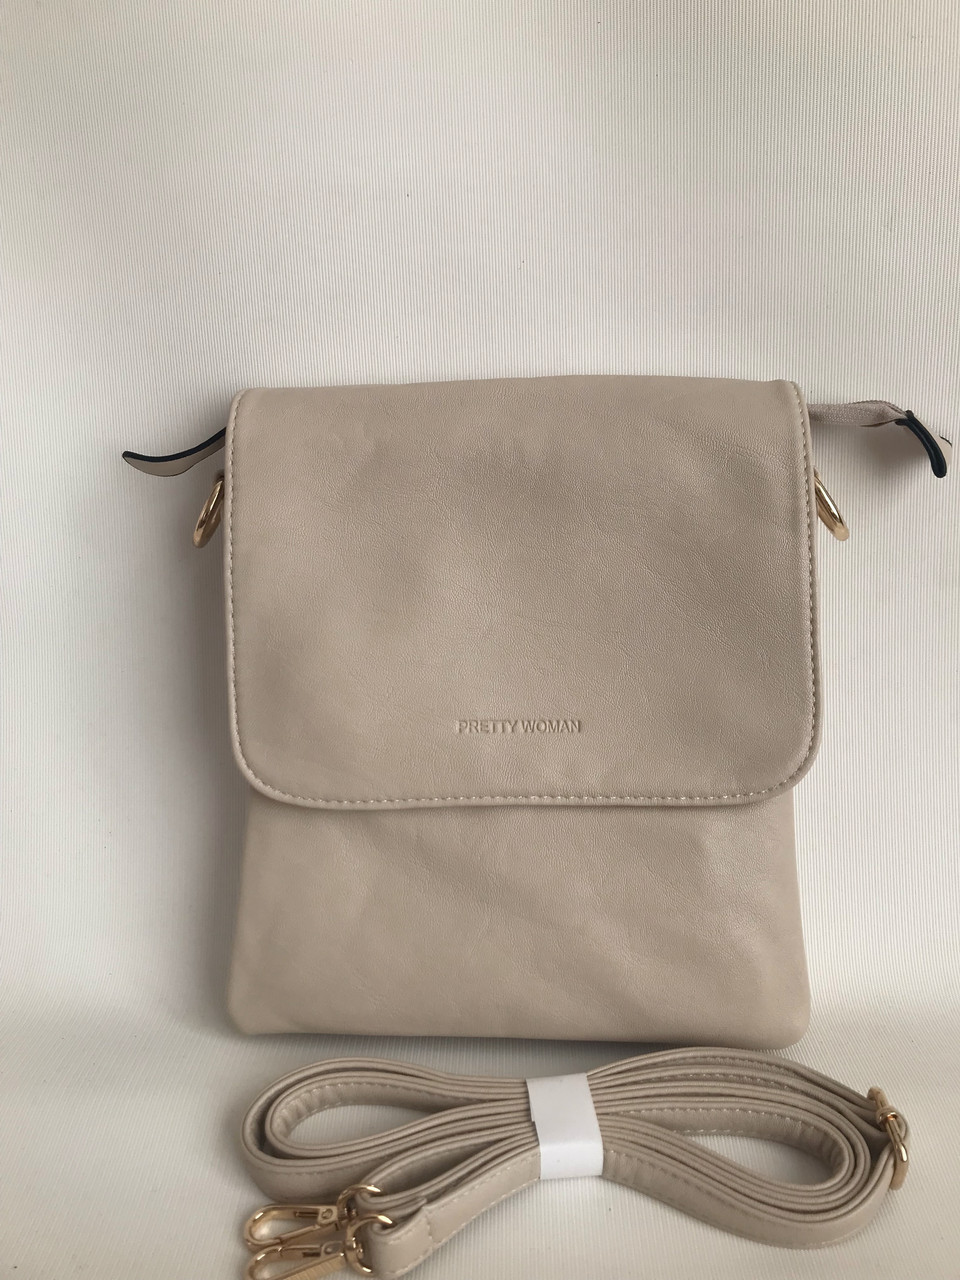 Женская сумка-планшет Pretty woman